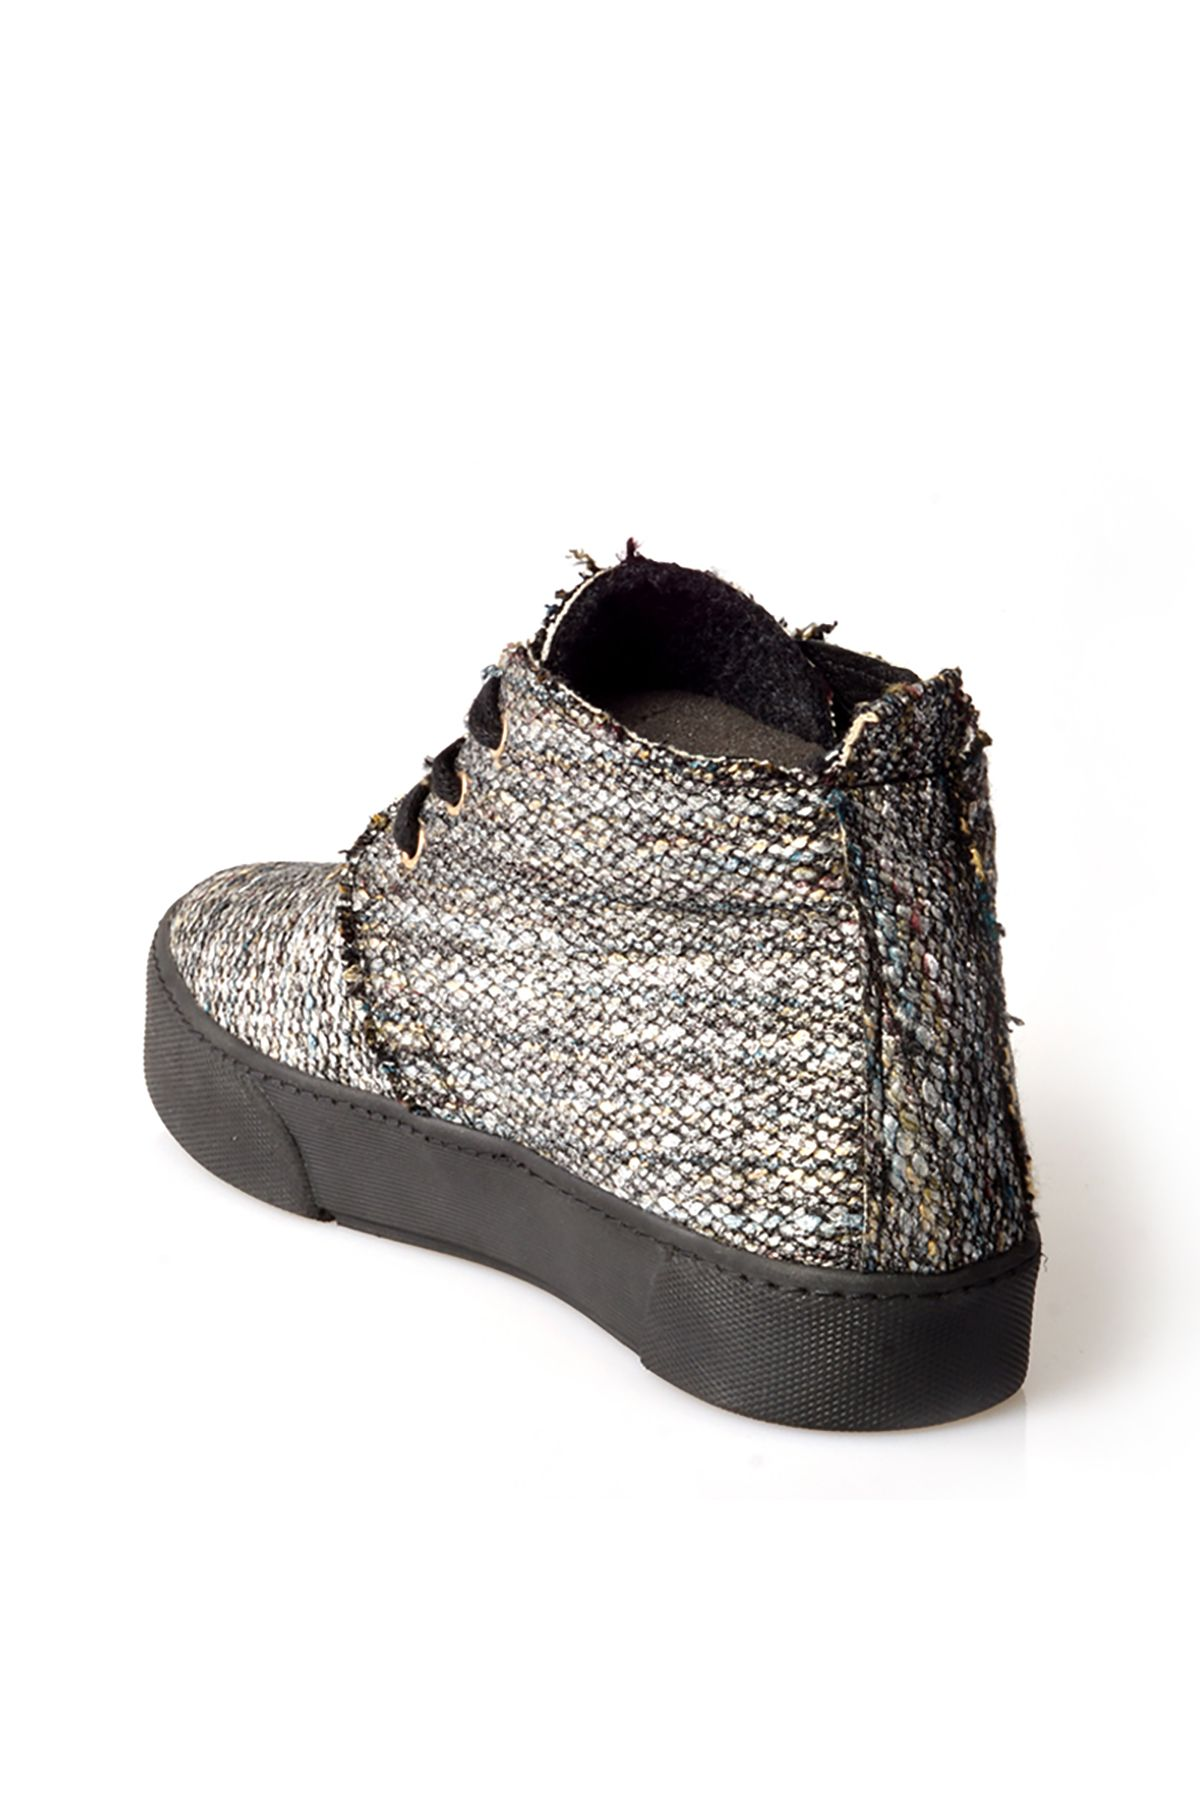 Art Goya Hakiki Kaşmir Bayan Sneaker 659502 Gümüş